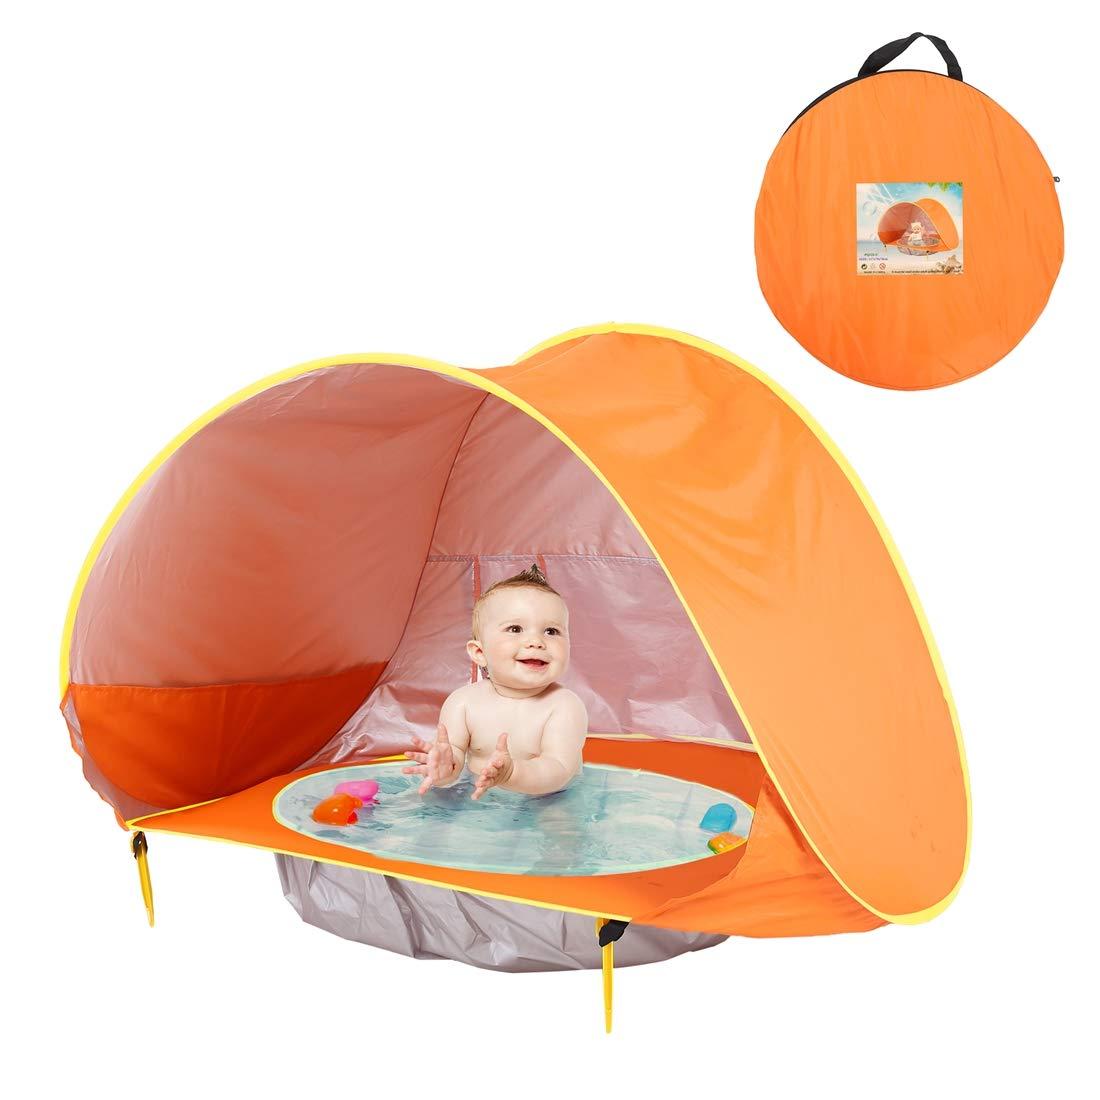 orange 117x79x70cm TENCMG Kids Beach Tent - Pop up Portable - Shade Pool UV Predection Sun Shelter for Kids